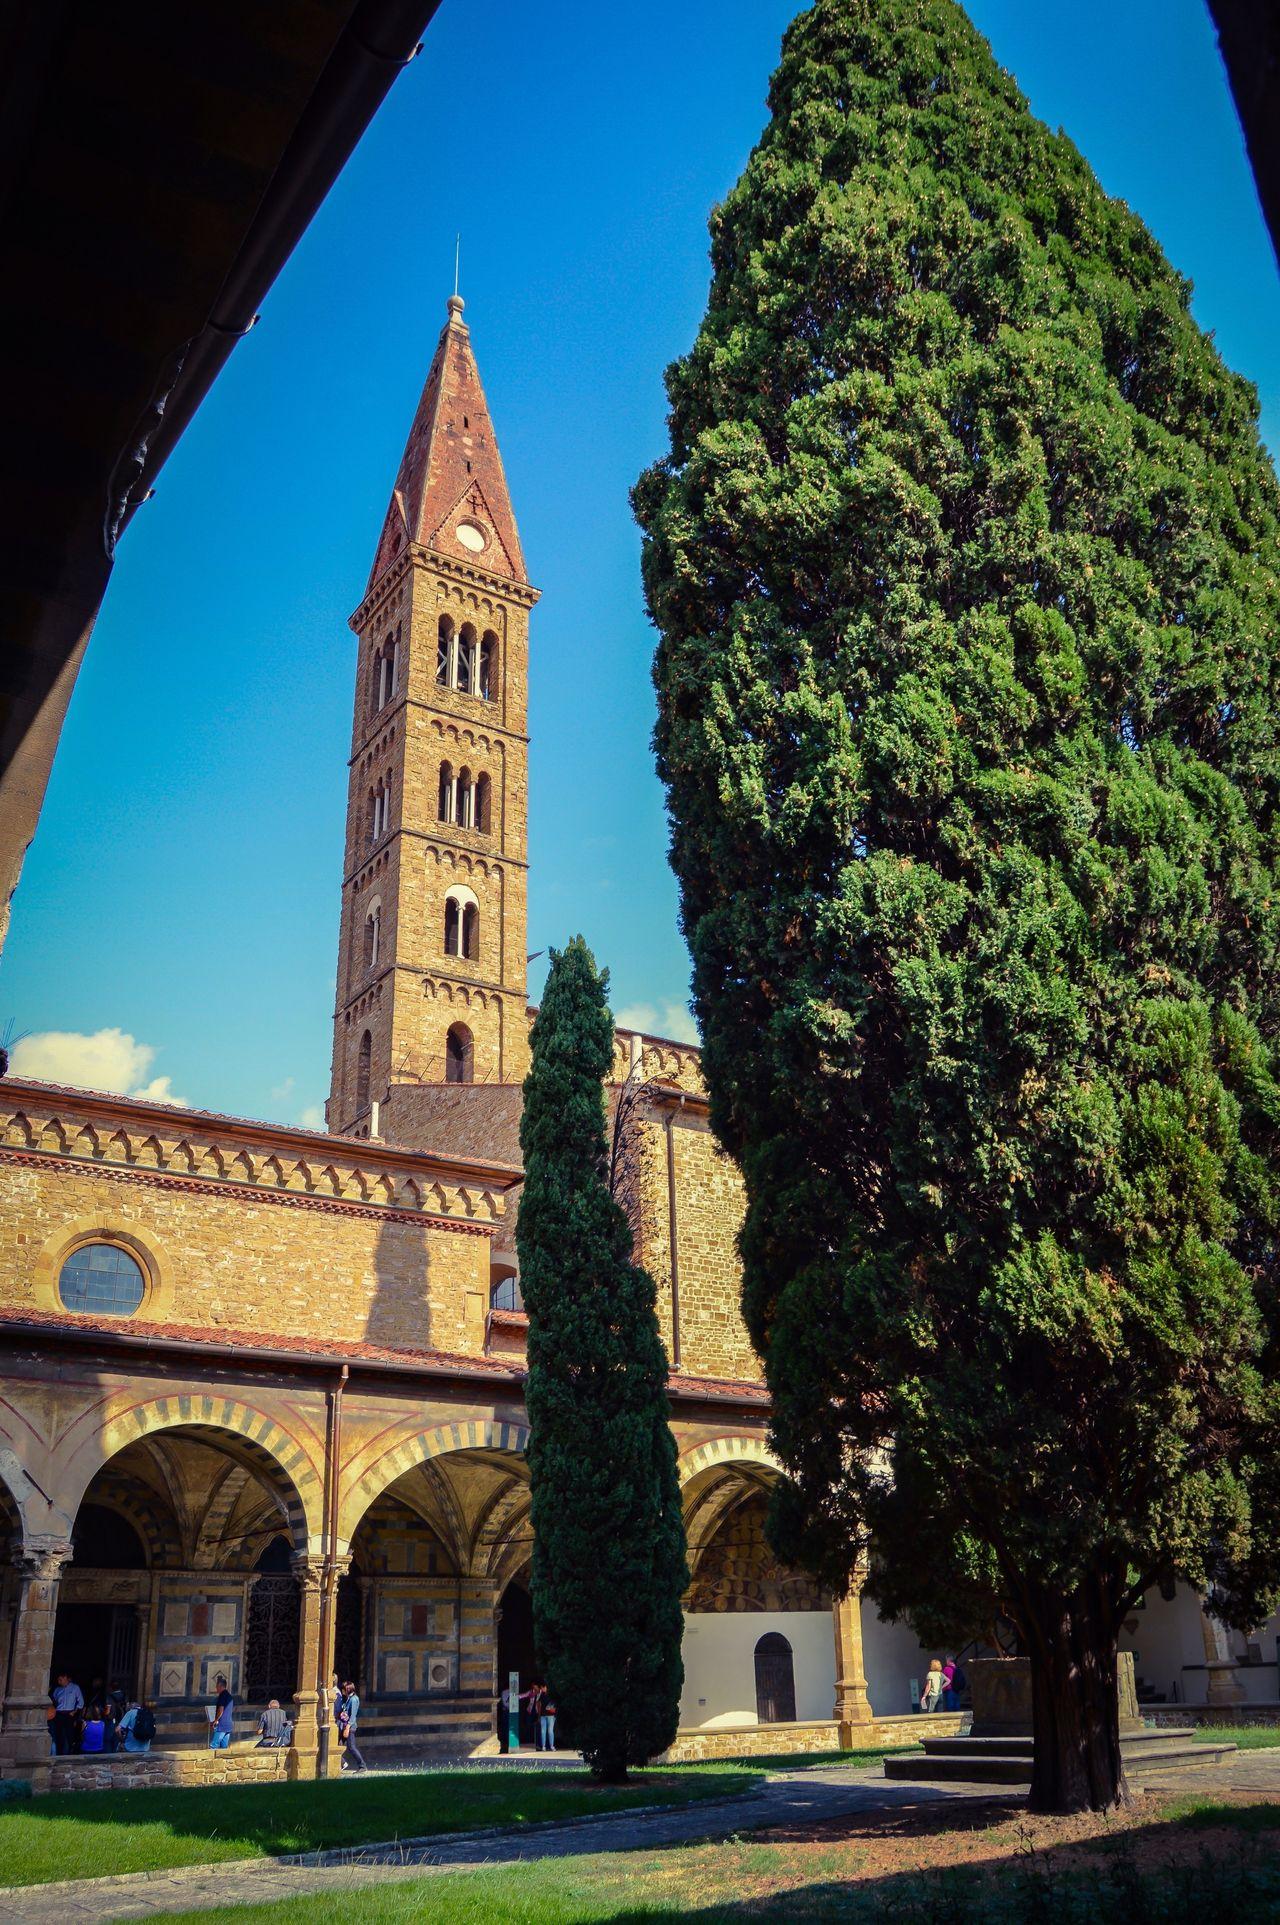 Convento de Santa Maria Novella (Florence - Italy) Architecture Tower Tree Travel Destinations Outdoors Travel Tourism Cloister Convent Florence Italy Arch Column